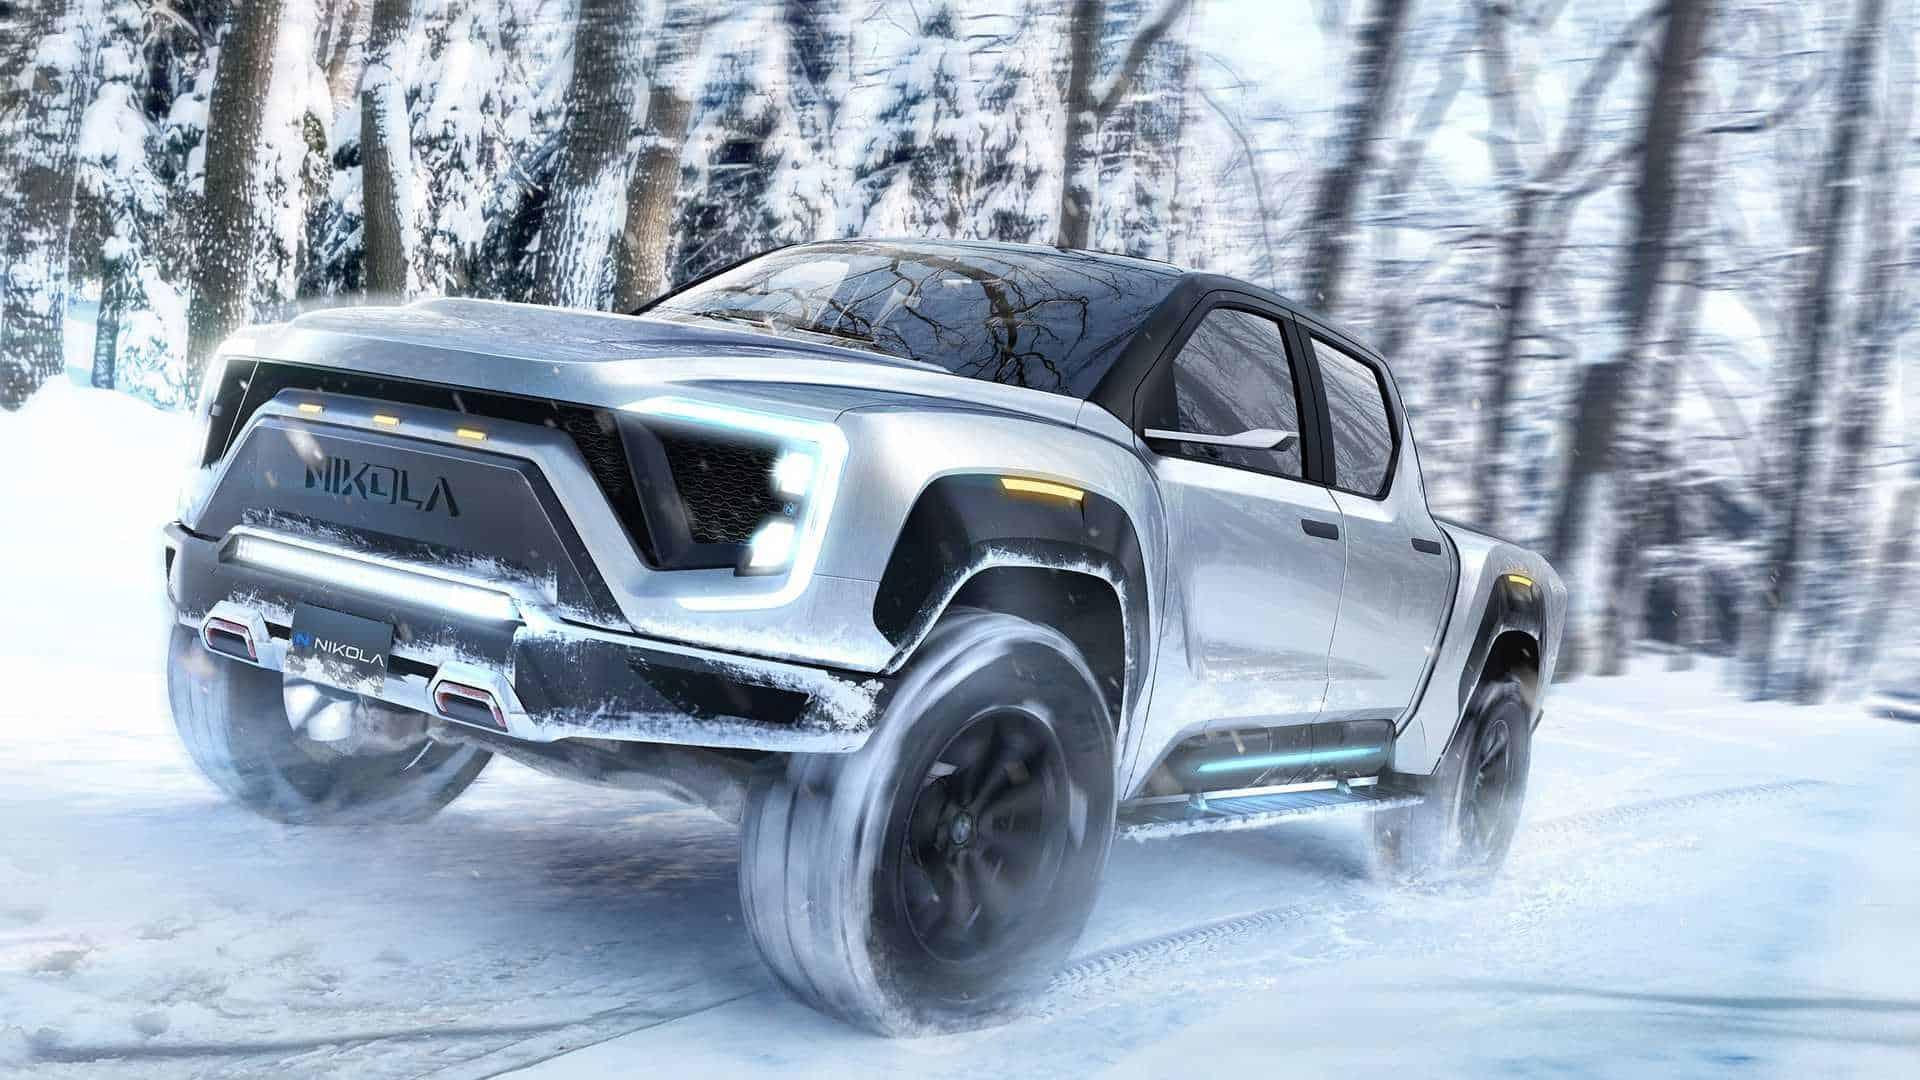 nikola-badger-electric-pickup-truck